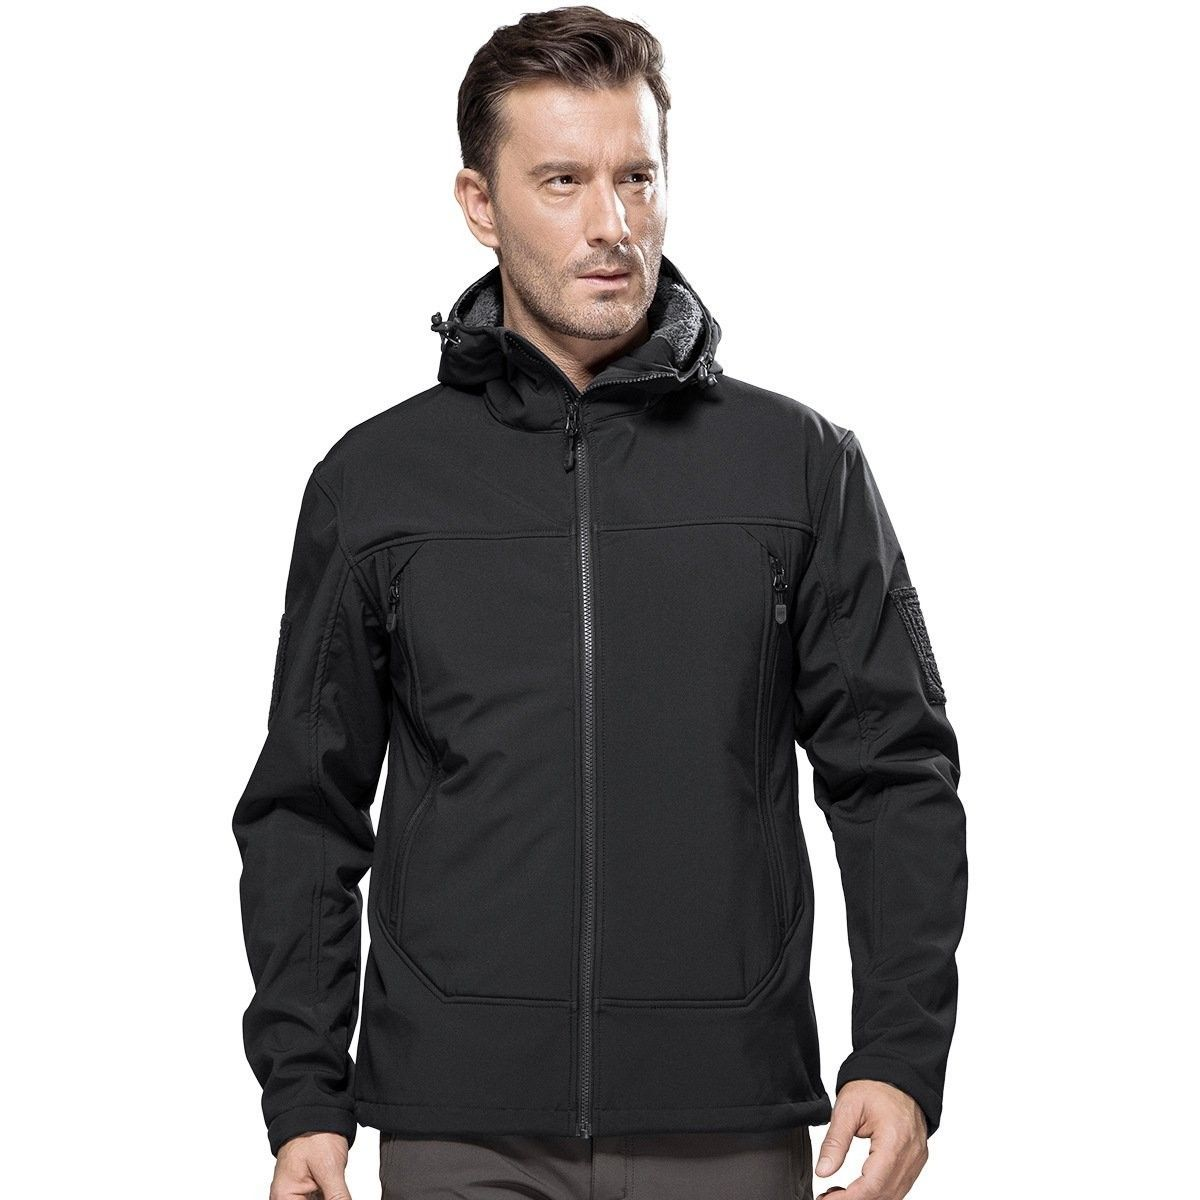 Men S Tactical Jacket Outdoor Fleece Lining Softshell Jacket For Hiking Black Cj186tc7nl9 Tactical Jacket Mens Outfits Soft Shell Jacket [ 1200 x 1200 Pixel ]